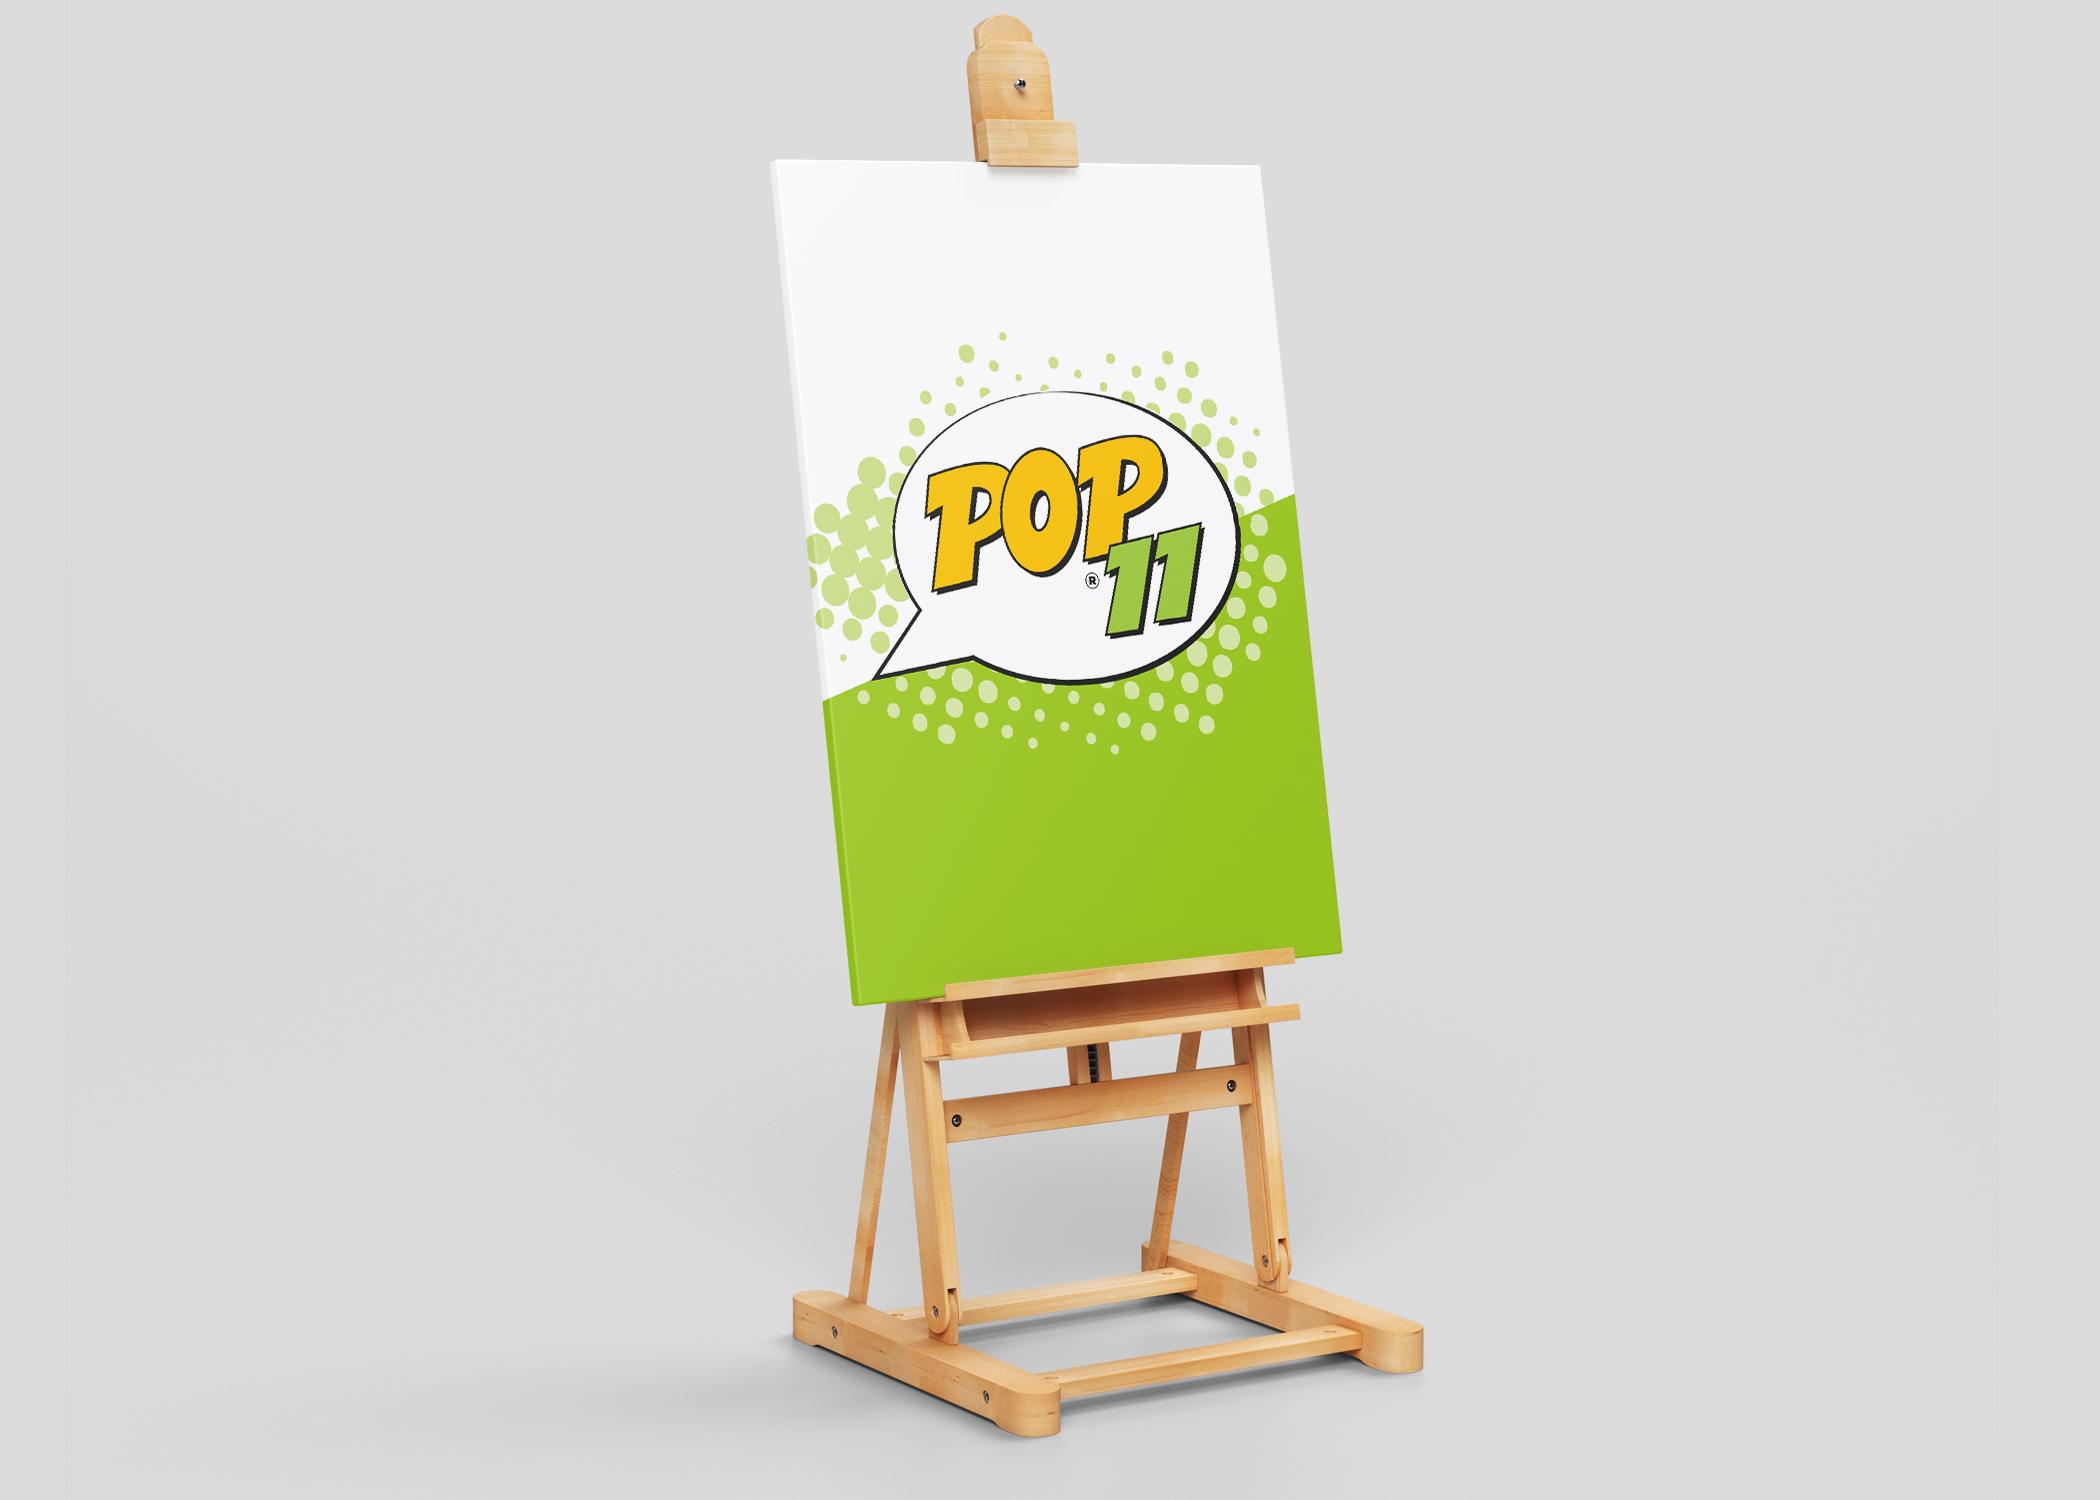 01 Canvas Pop11 Digital Prints